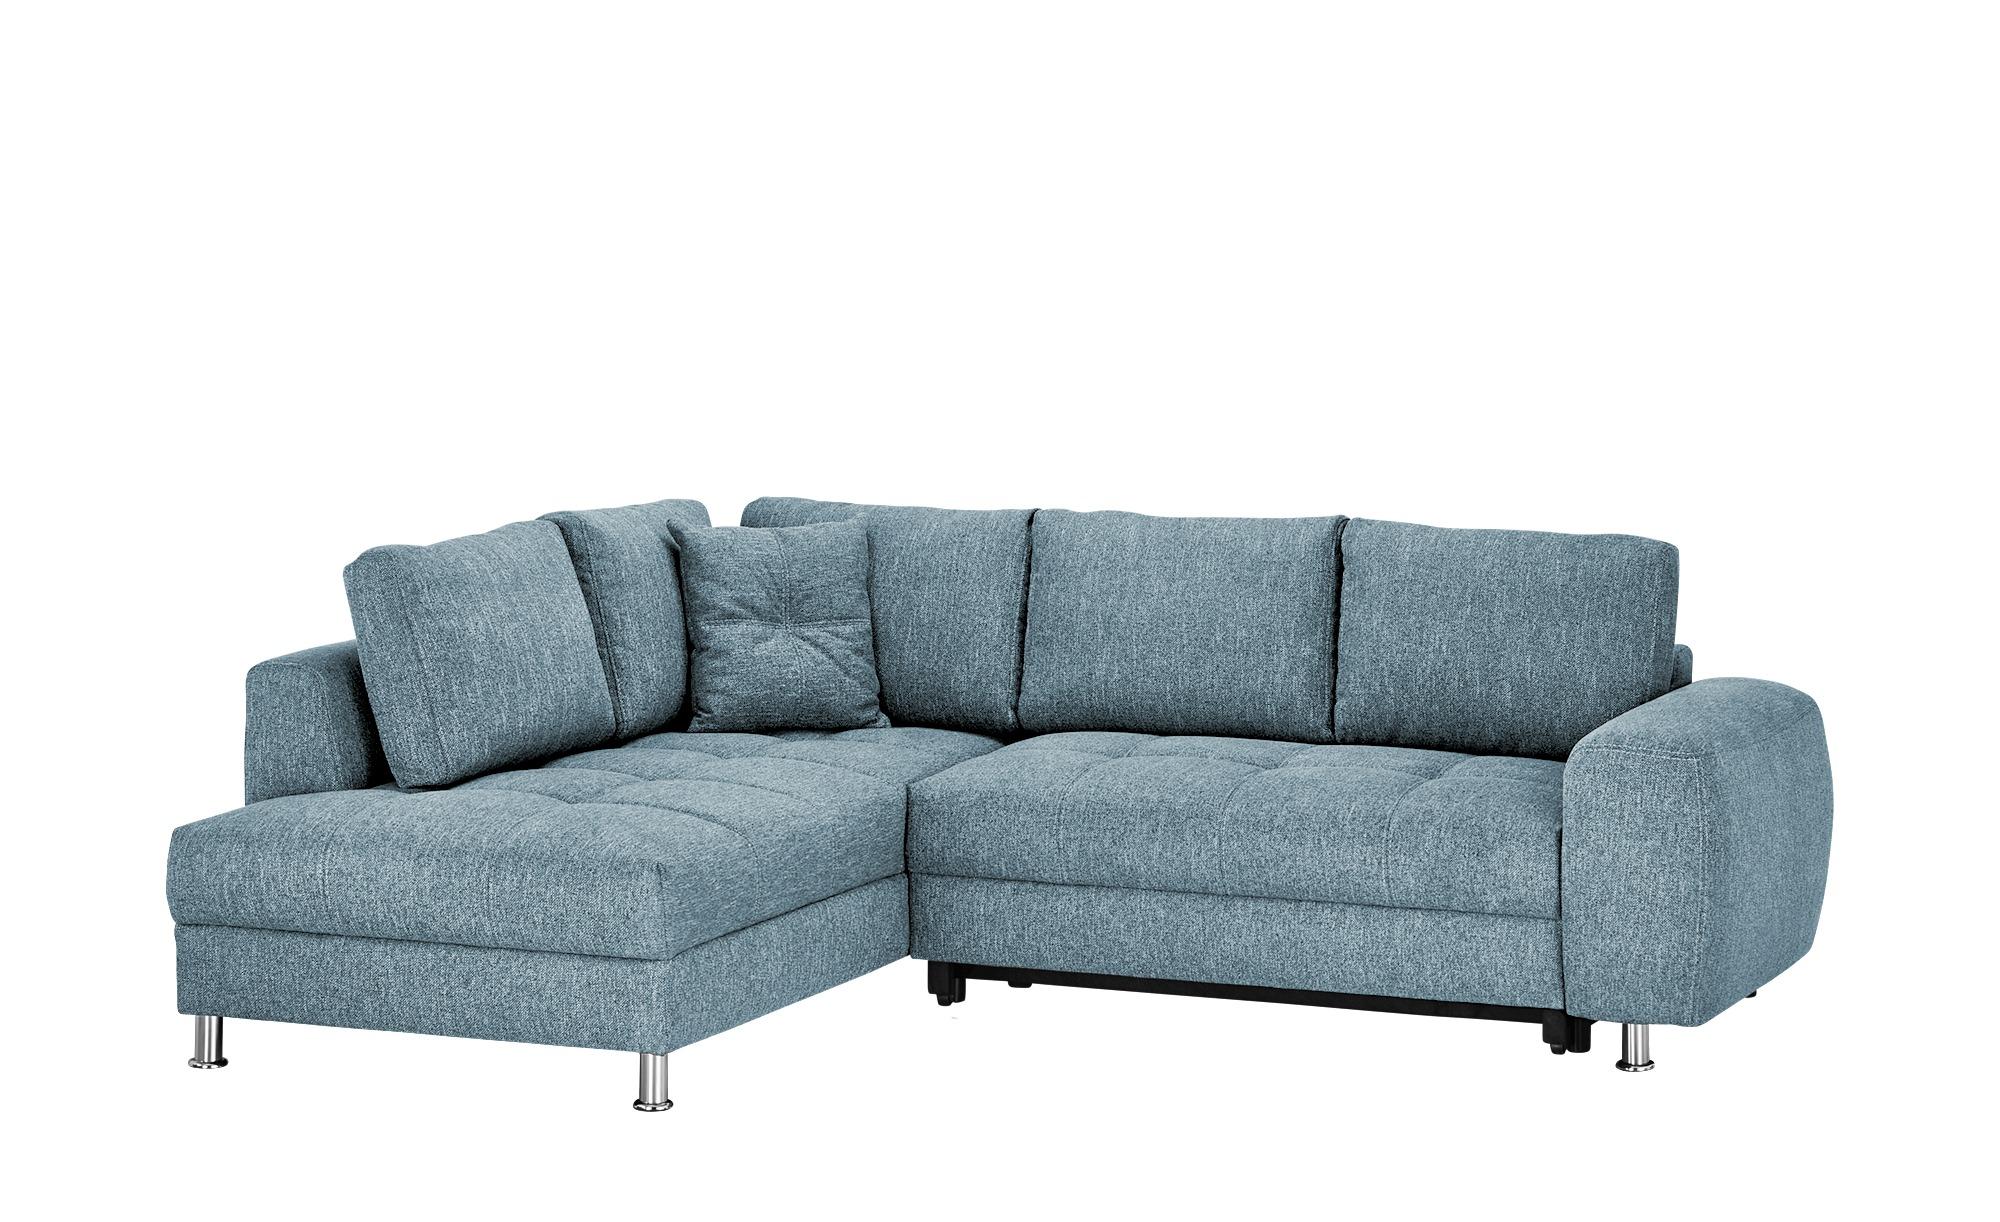 bobb Ecksofa  Guilia ¦ blau ¦ Maße (cm): H: 92 Polstermöbel > Sofas > Ecksofas - Höffner